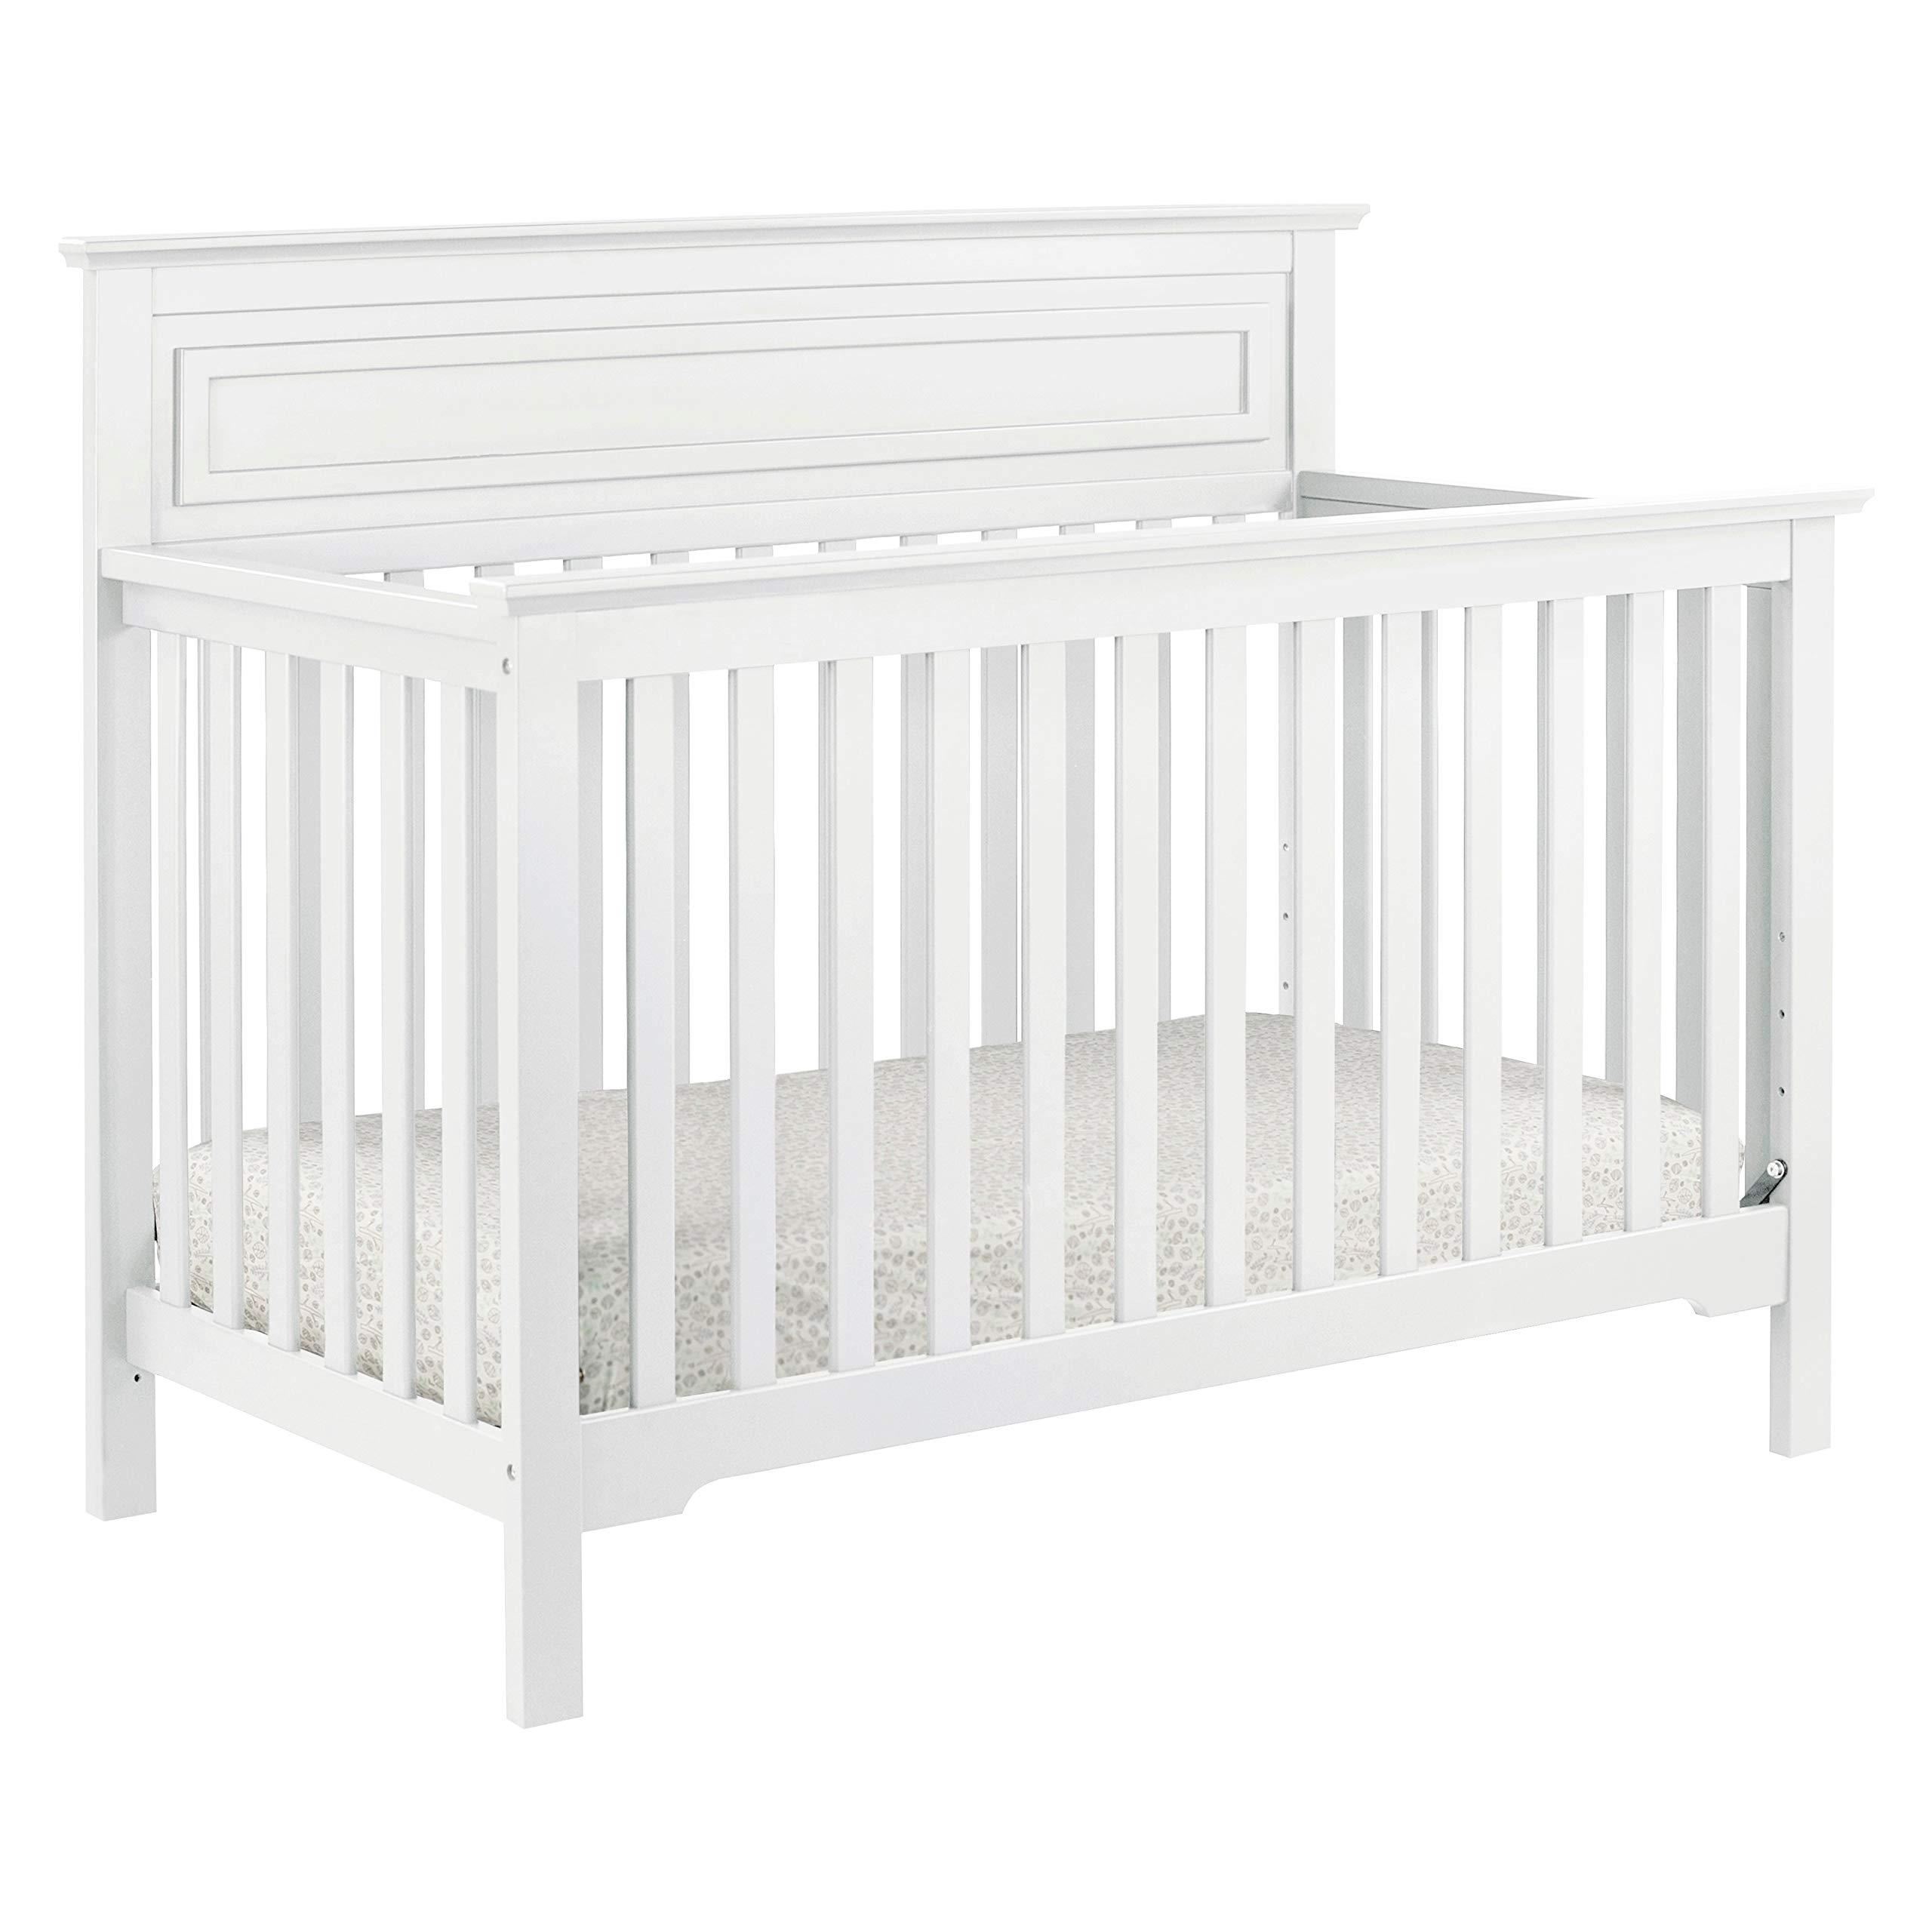 DaVinci Autumn Convertible Crib White